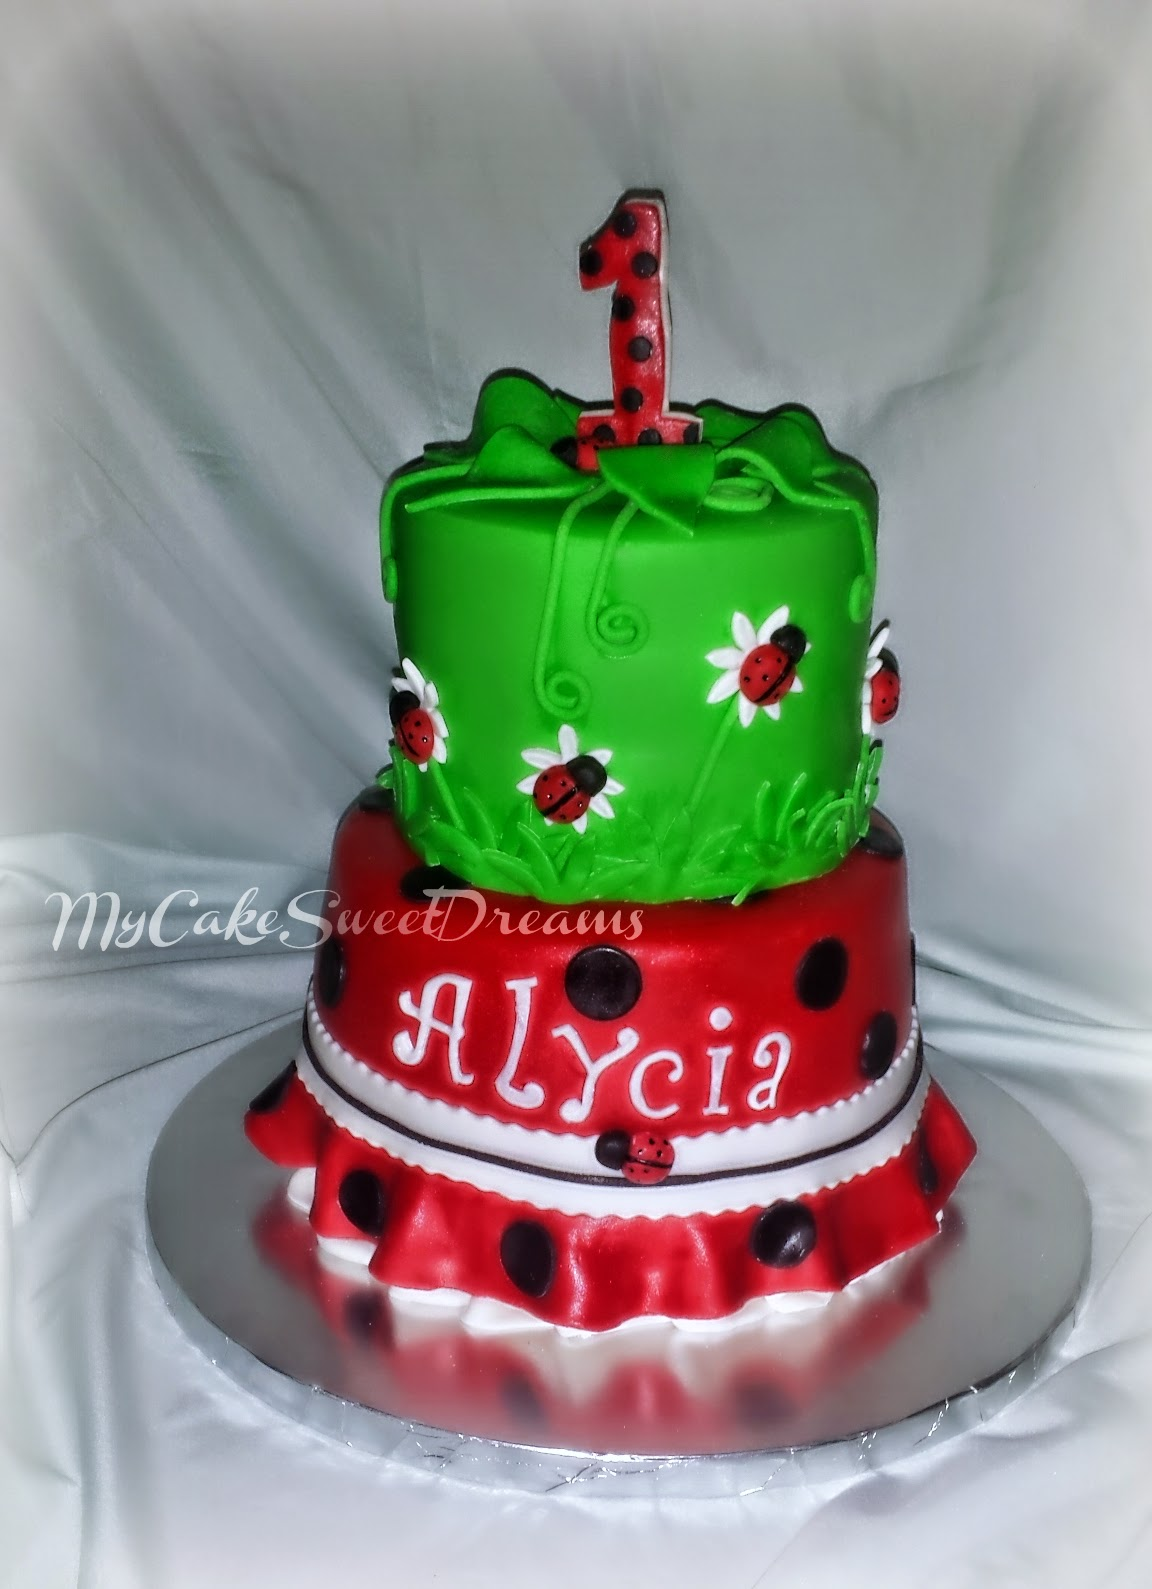 My Cake Sweet Dreams Ladybug 1st Birthday Cake